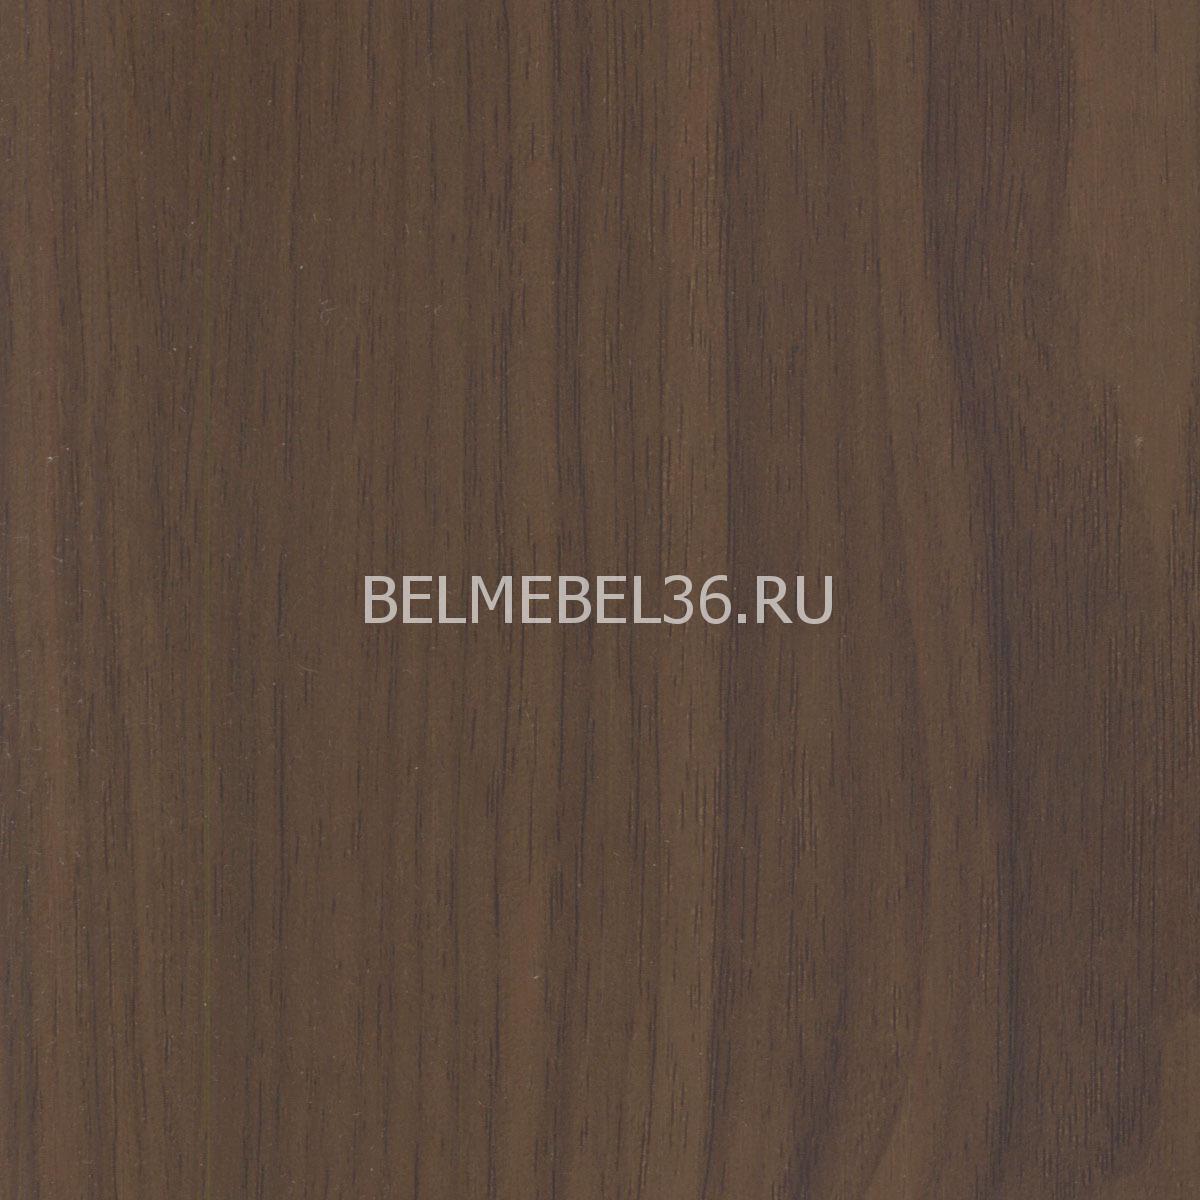 Диван-тахта Орегон (3М) П-Д150   Белорусская мебель в Воронеже